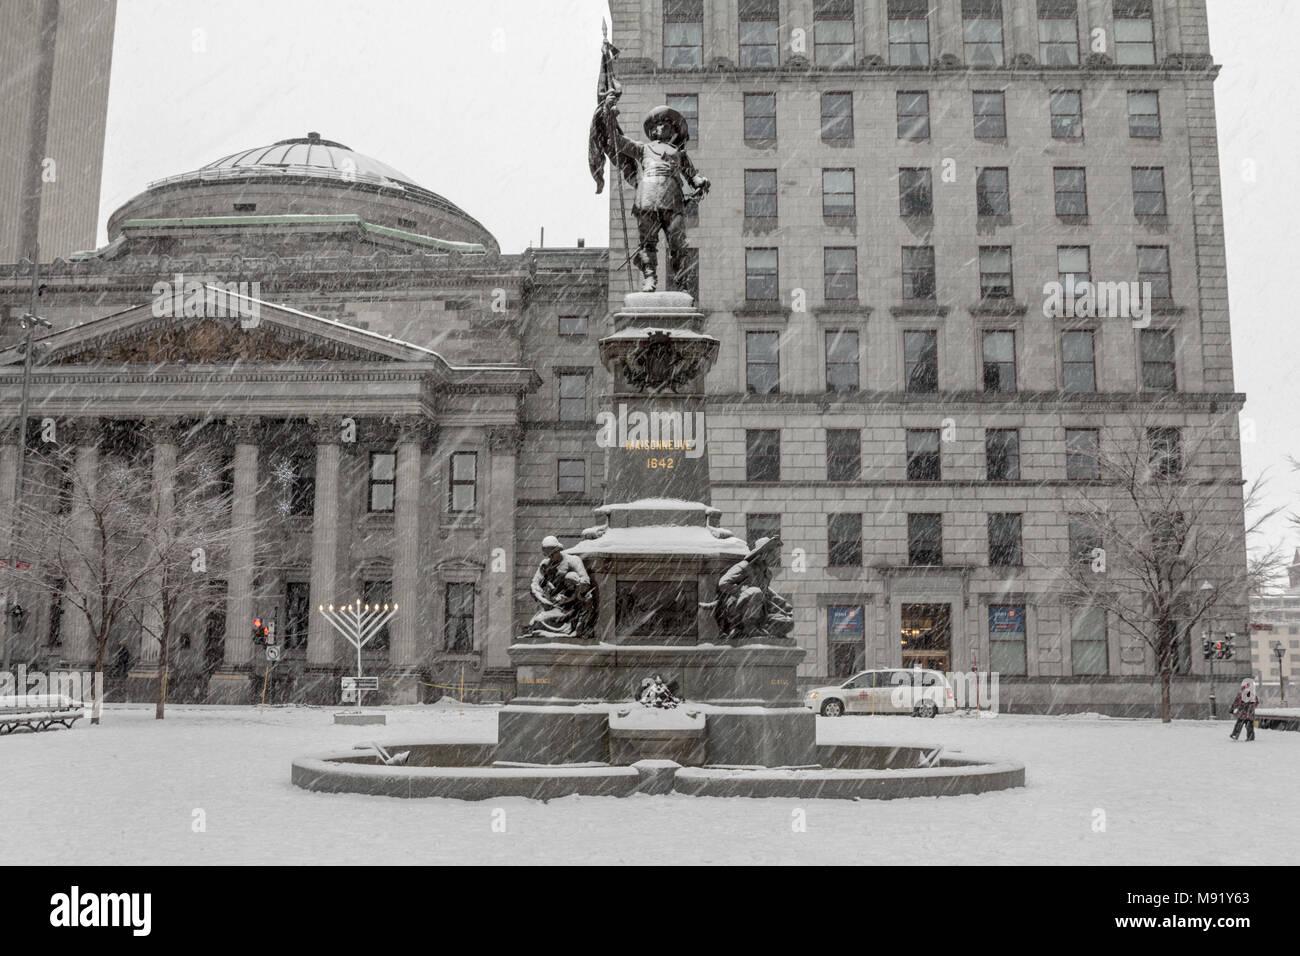 MONTREAL, CANADA - DECEMBER 24, 2016: Maisonneuve monument on place d'Armes square during a snowstorm. It is a monument dedicated to Maisonneuve, the  - Stock Image